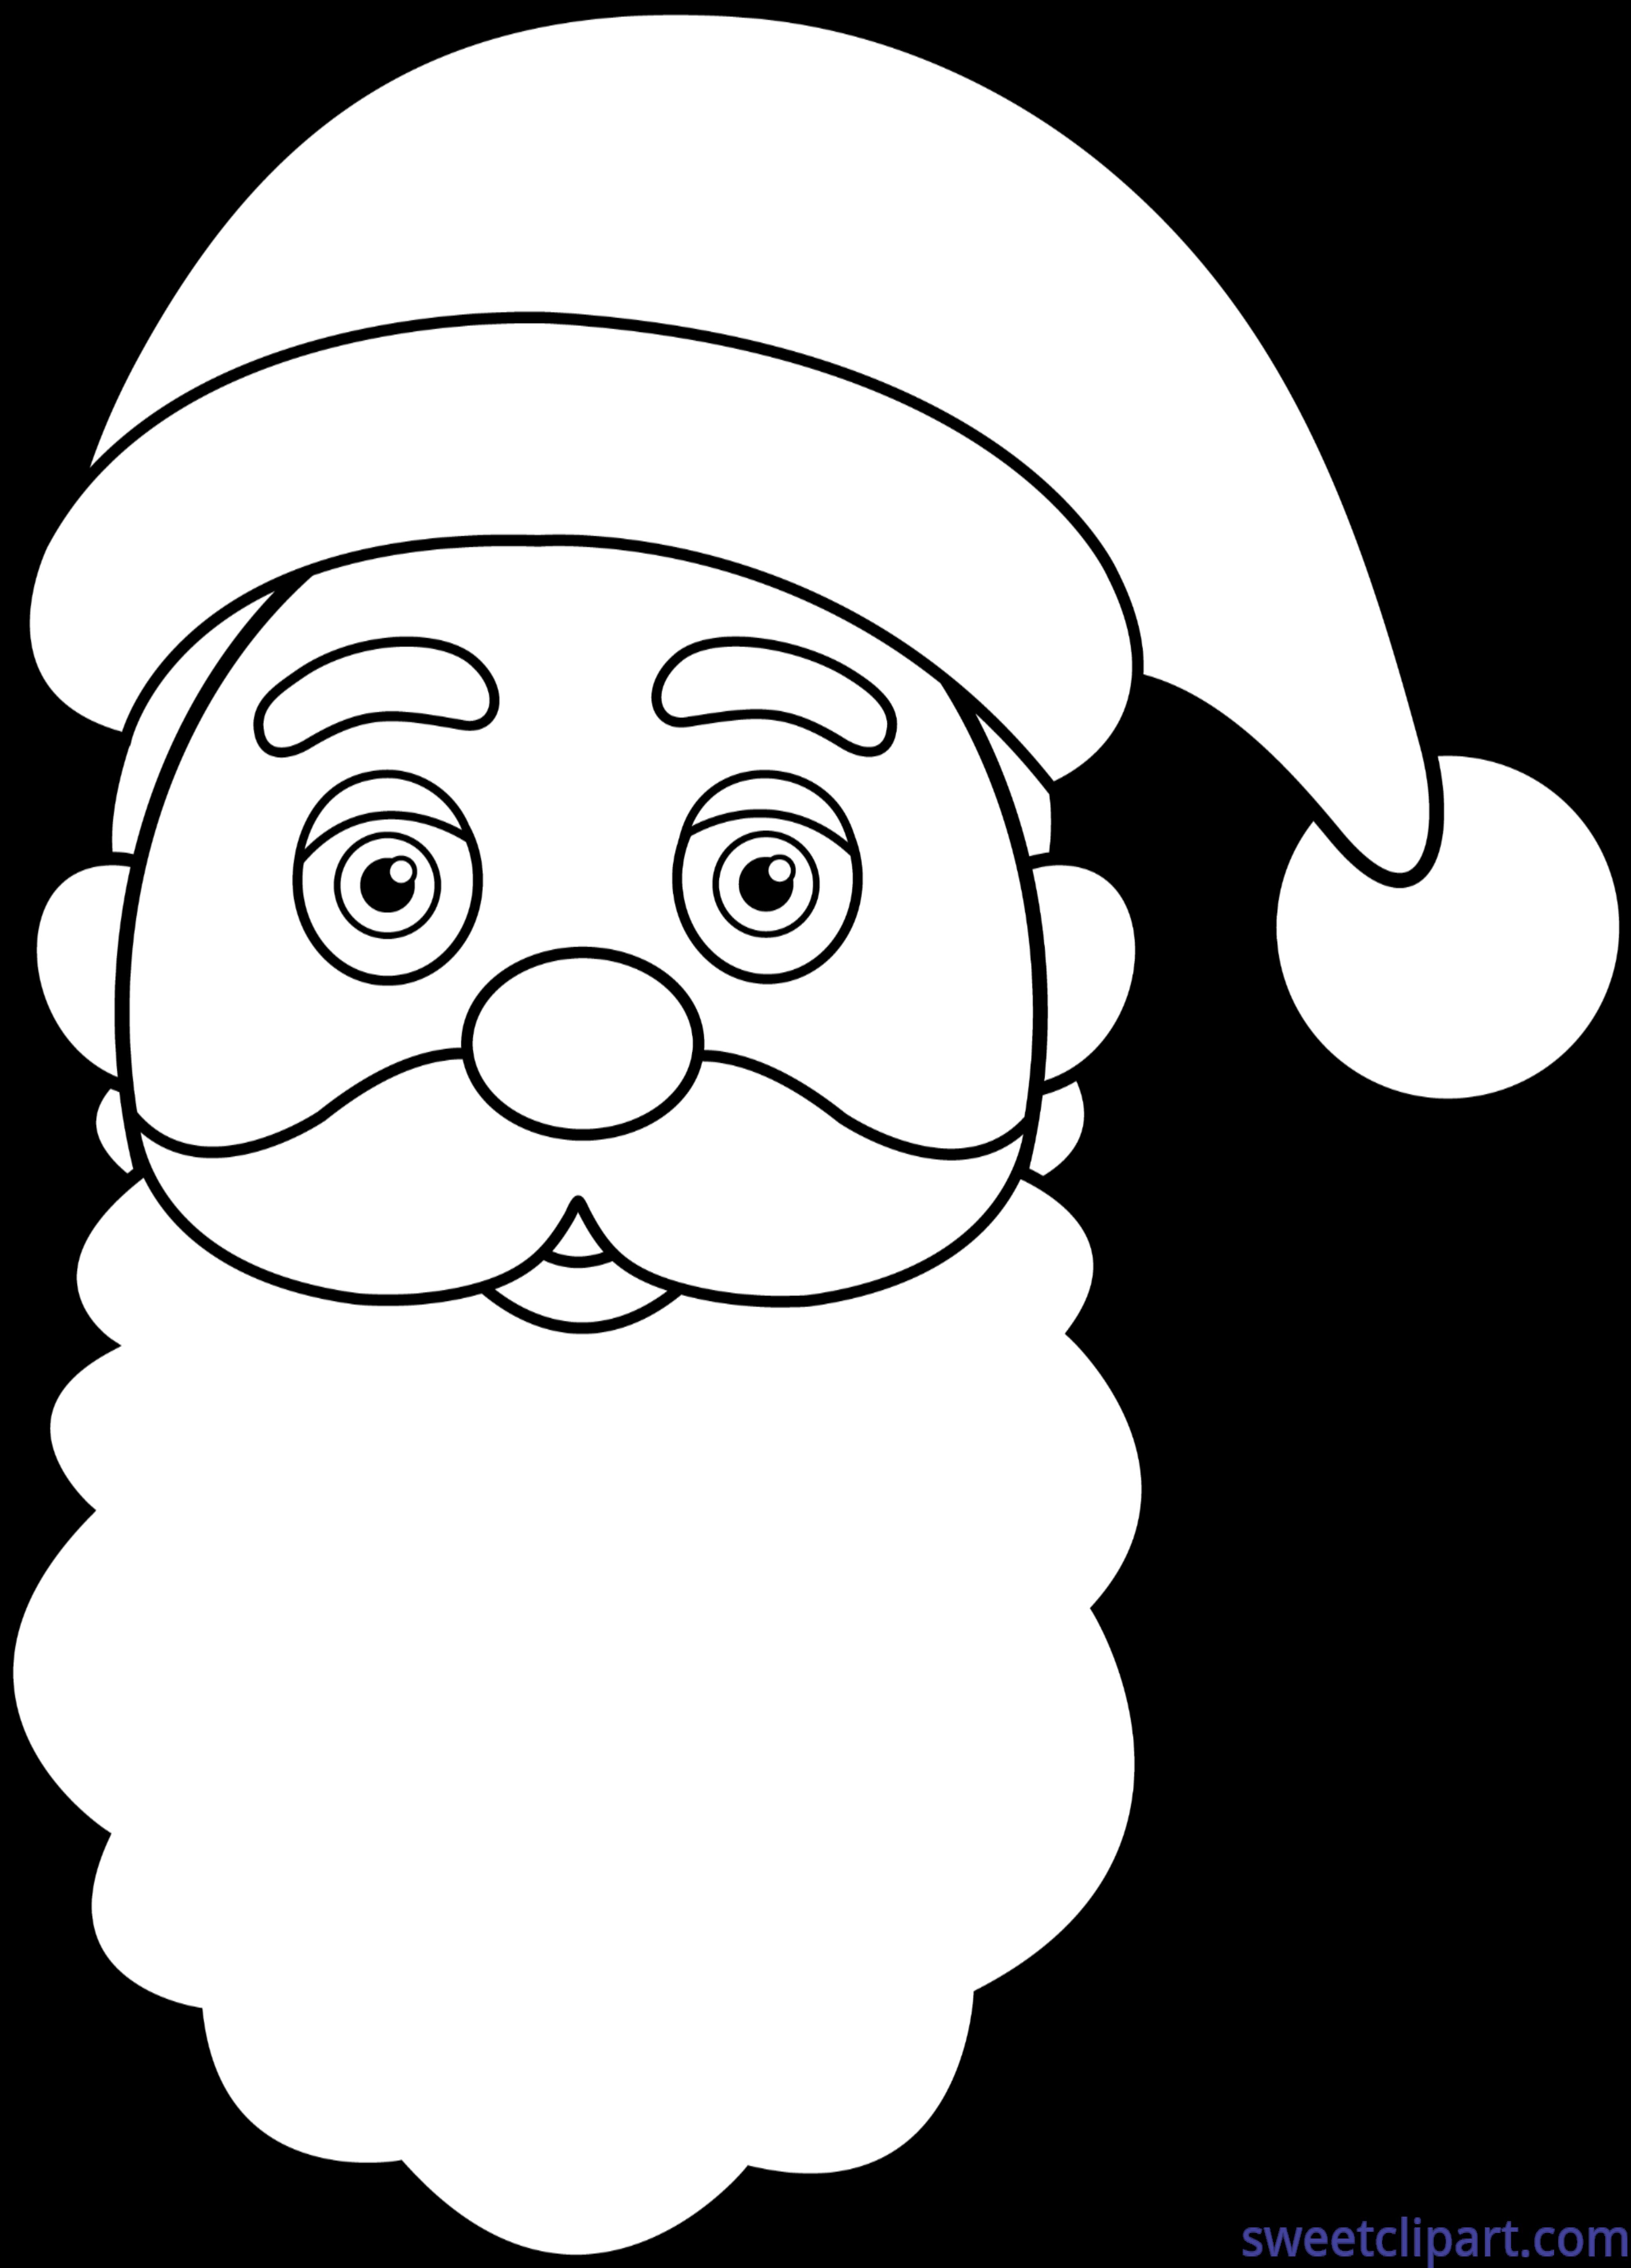 Lineart clip art sweet. Face clipart santa claus